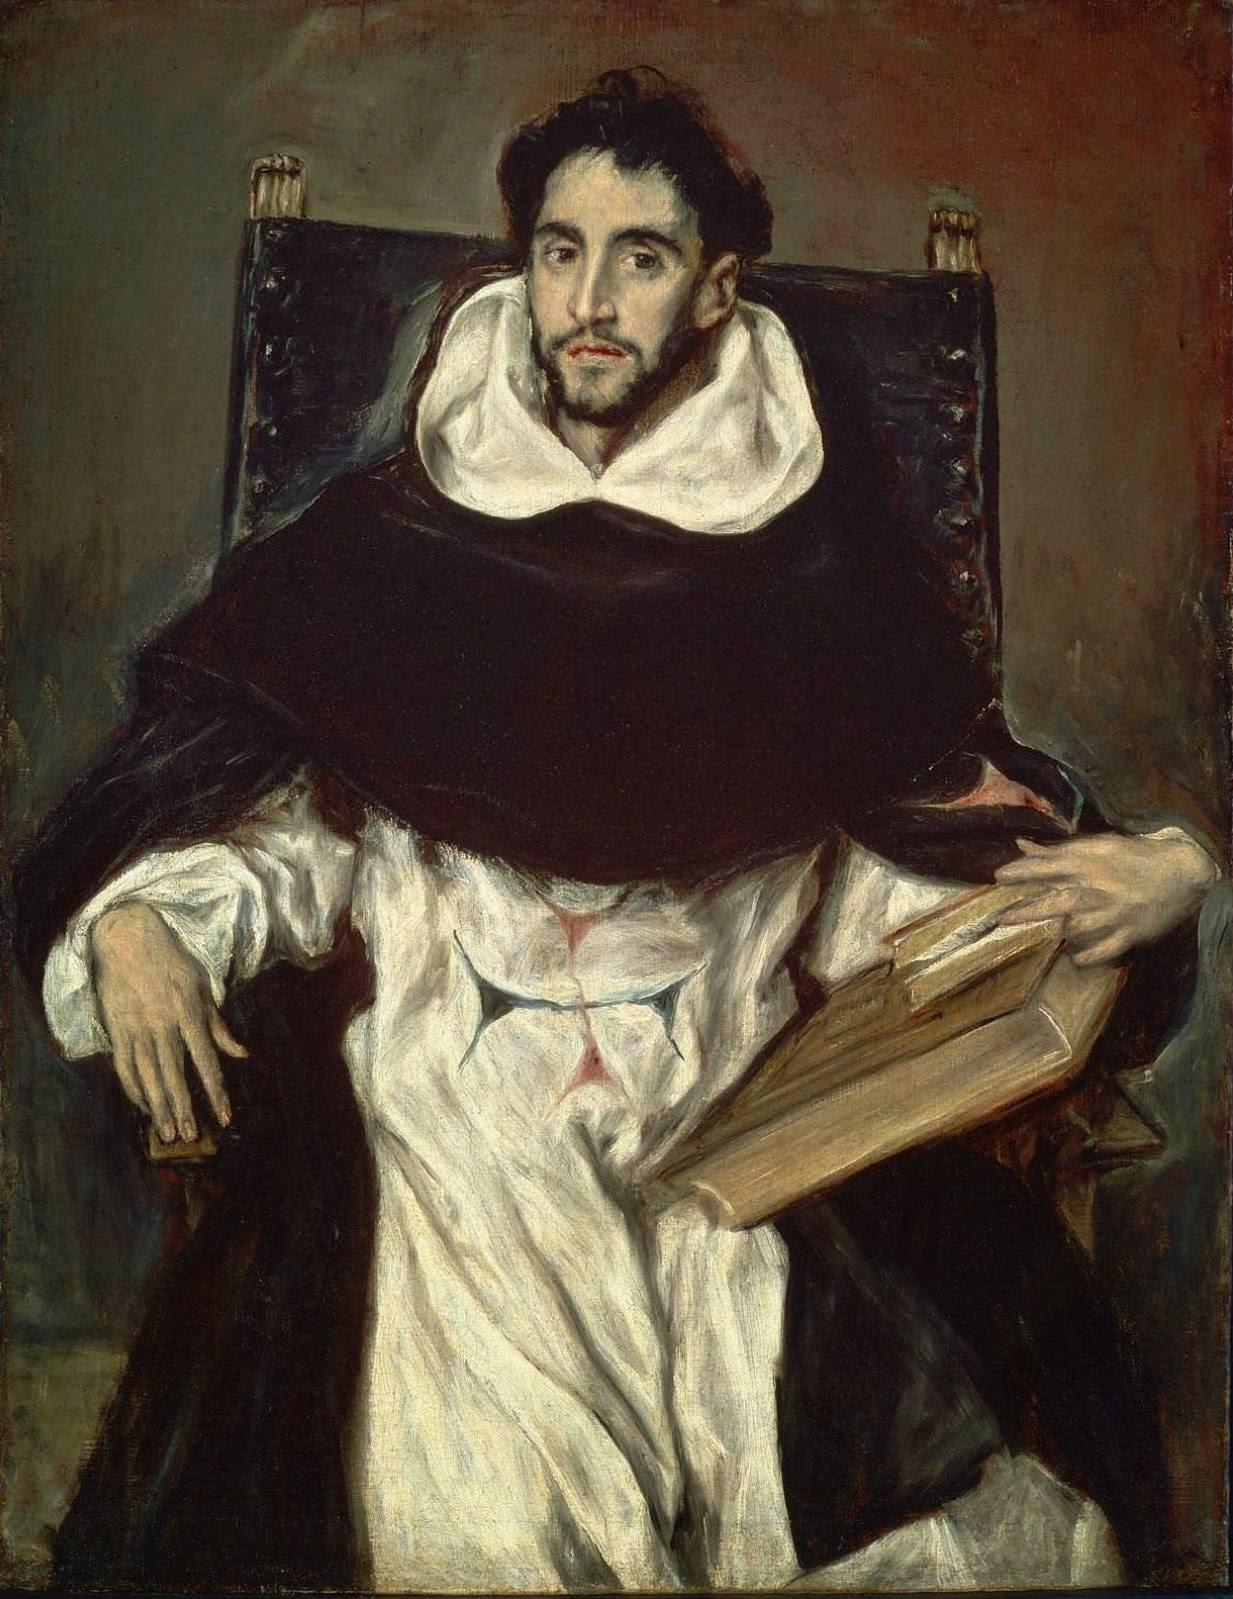 Fray Hortensio Paravicino